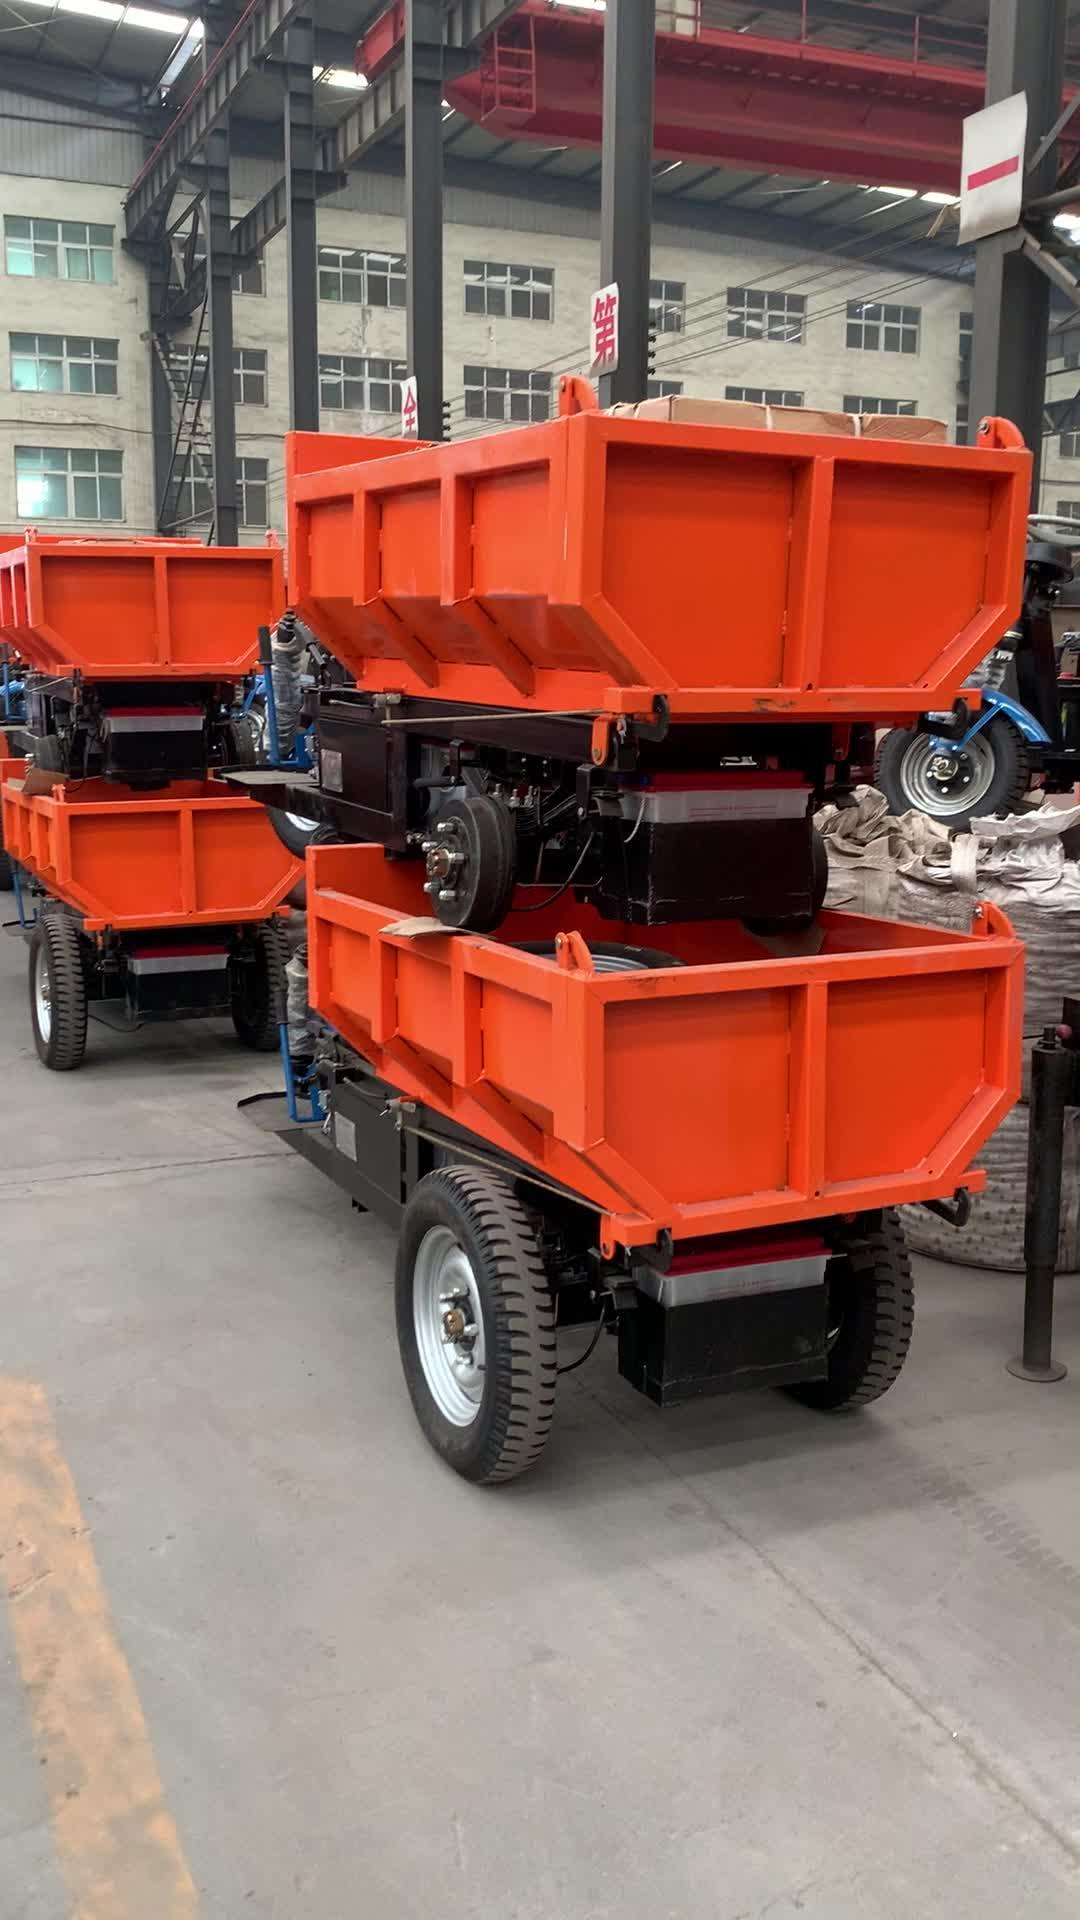 Loading 2 디젤 엔진 덤퍼 세발 자전거 광석